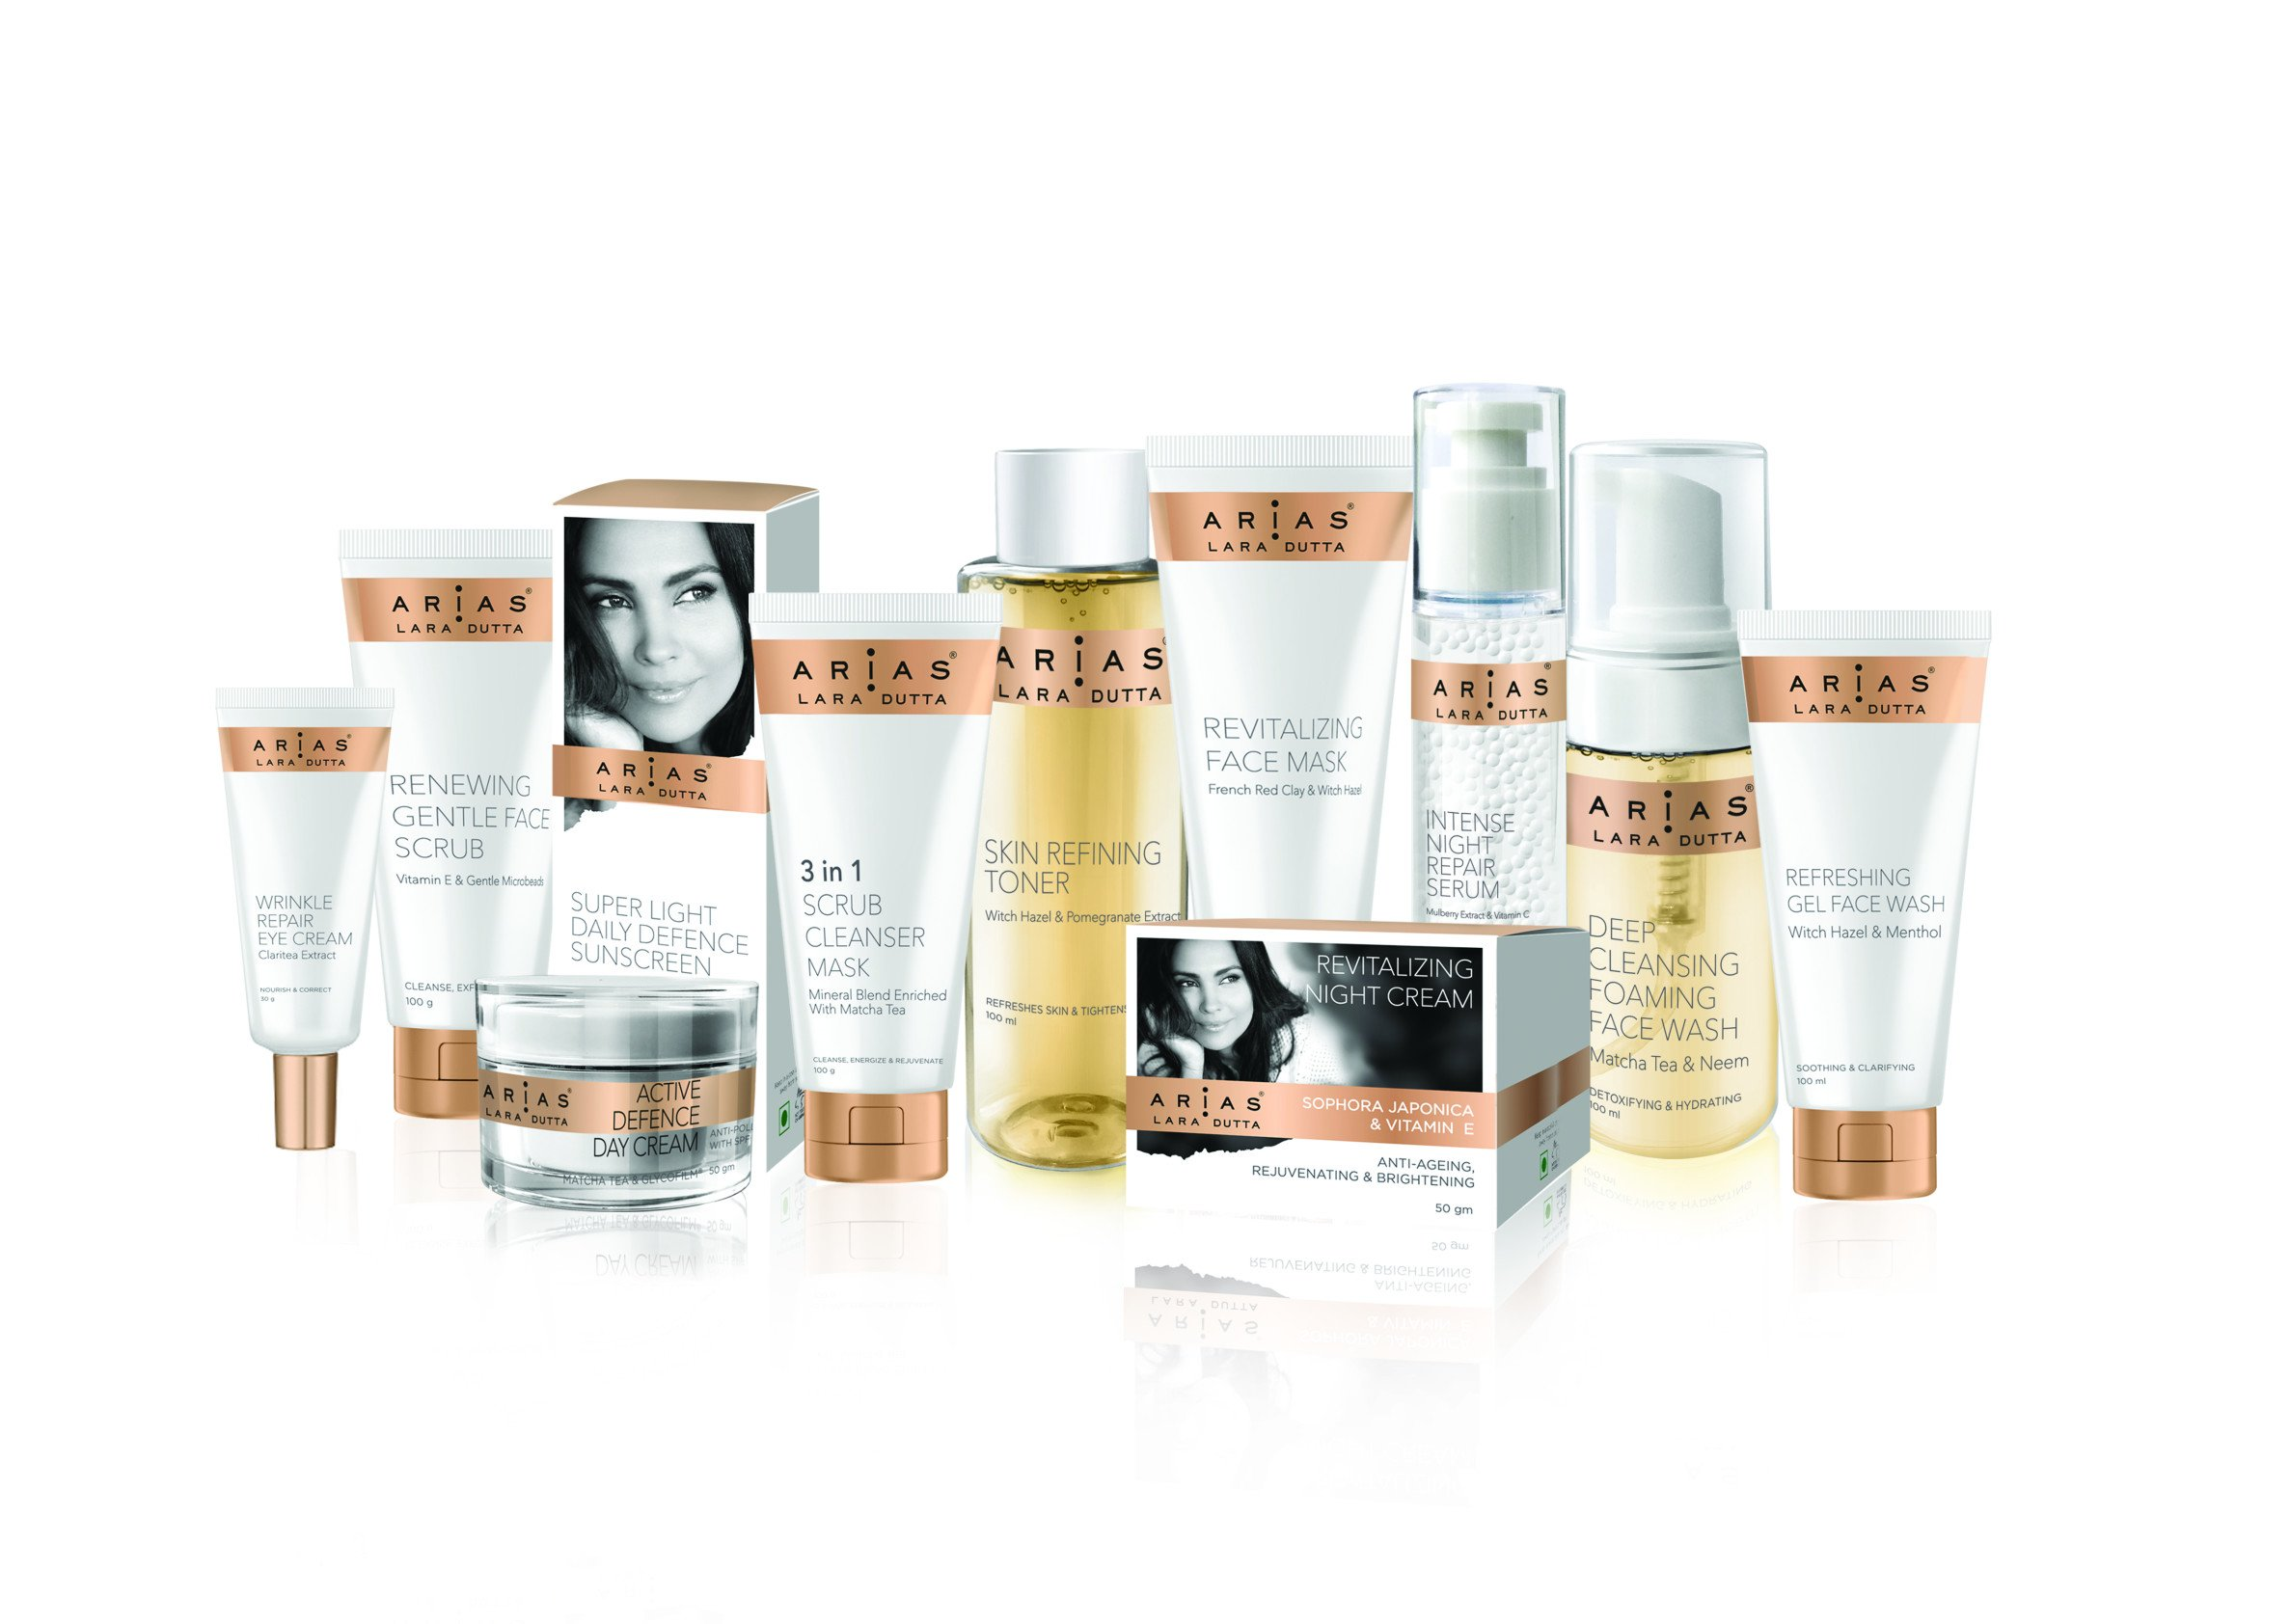 Scentials launches skin care brand 'Arias' with Lara Dutta